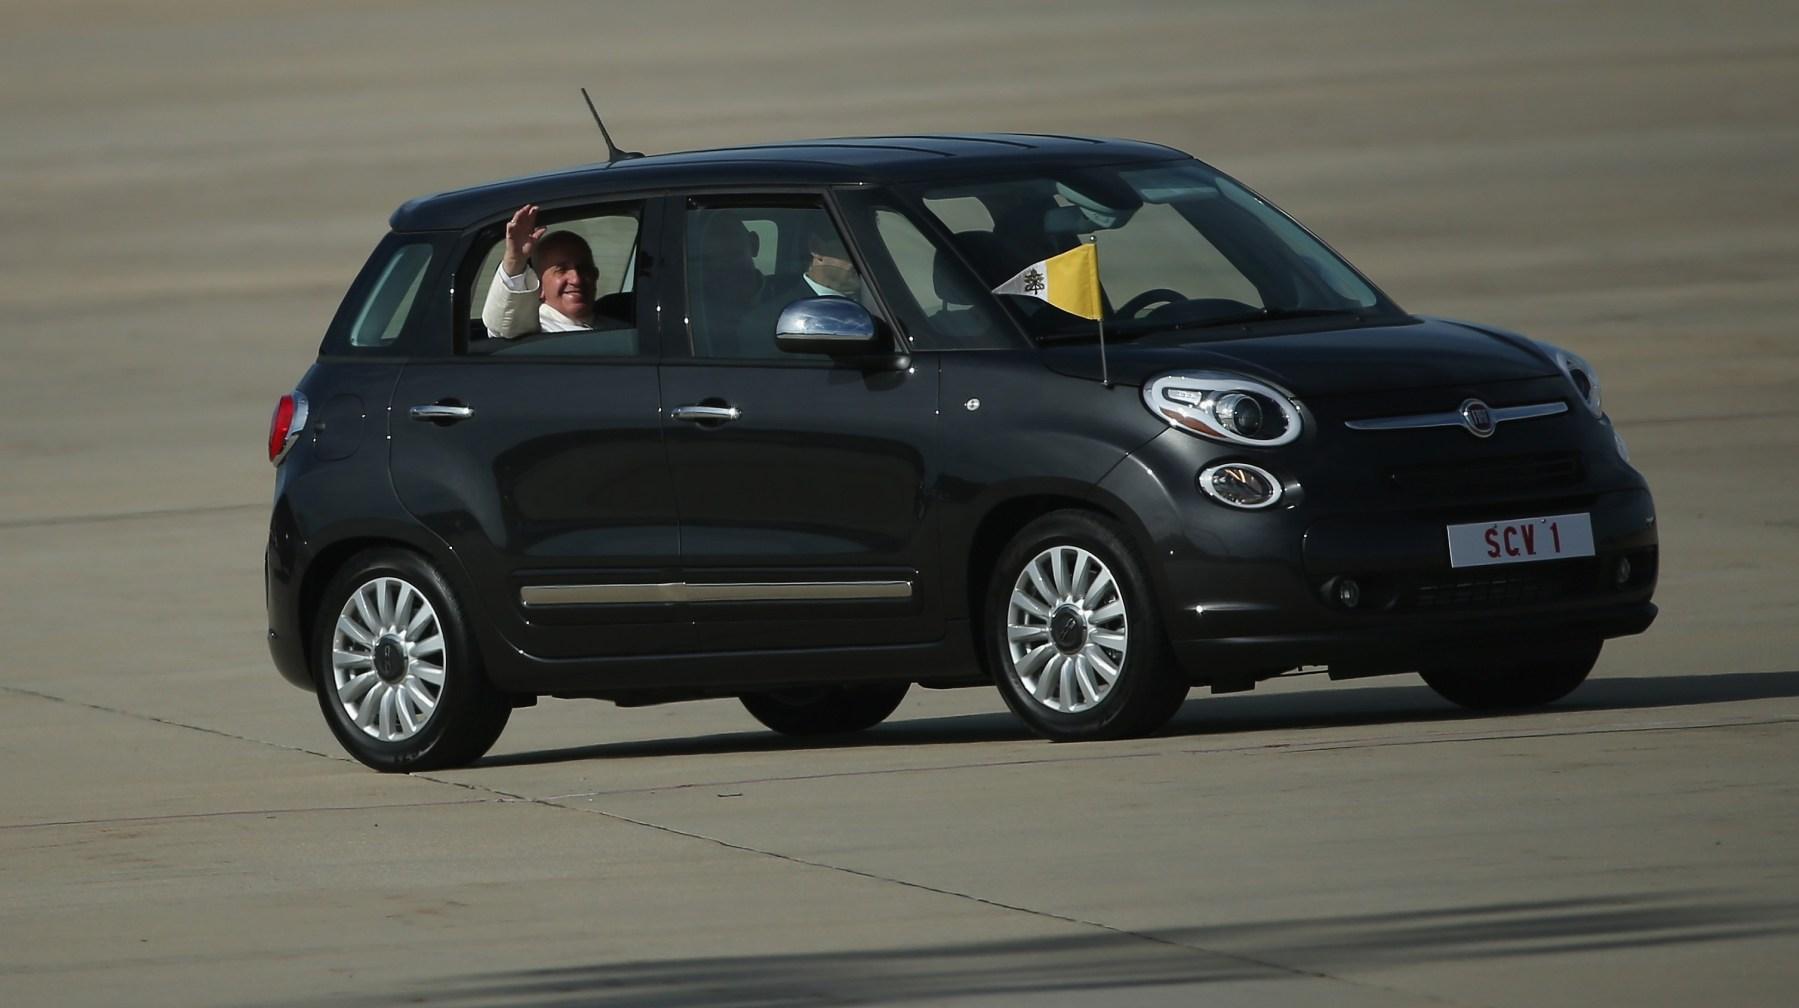 Pope's Fiat